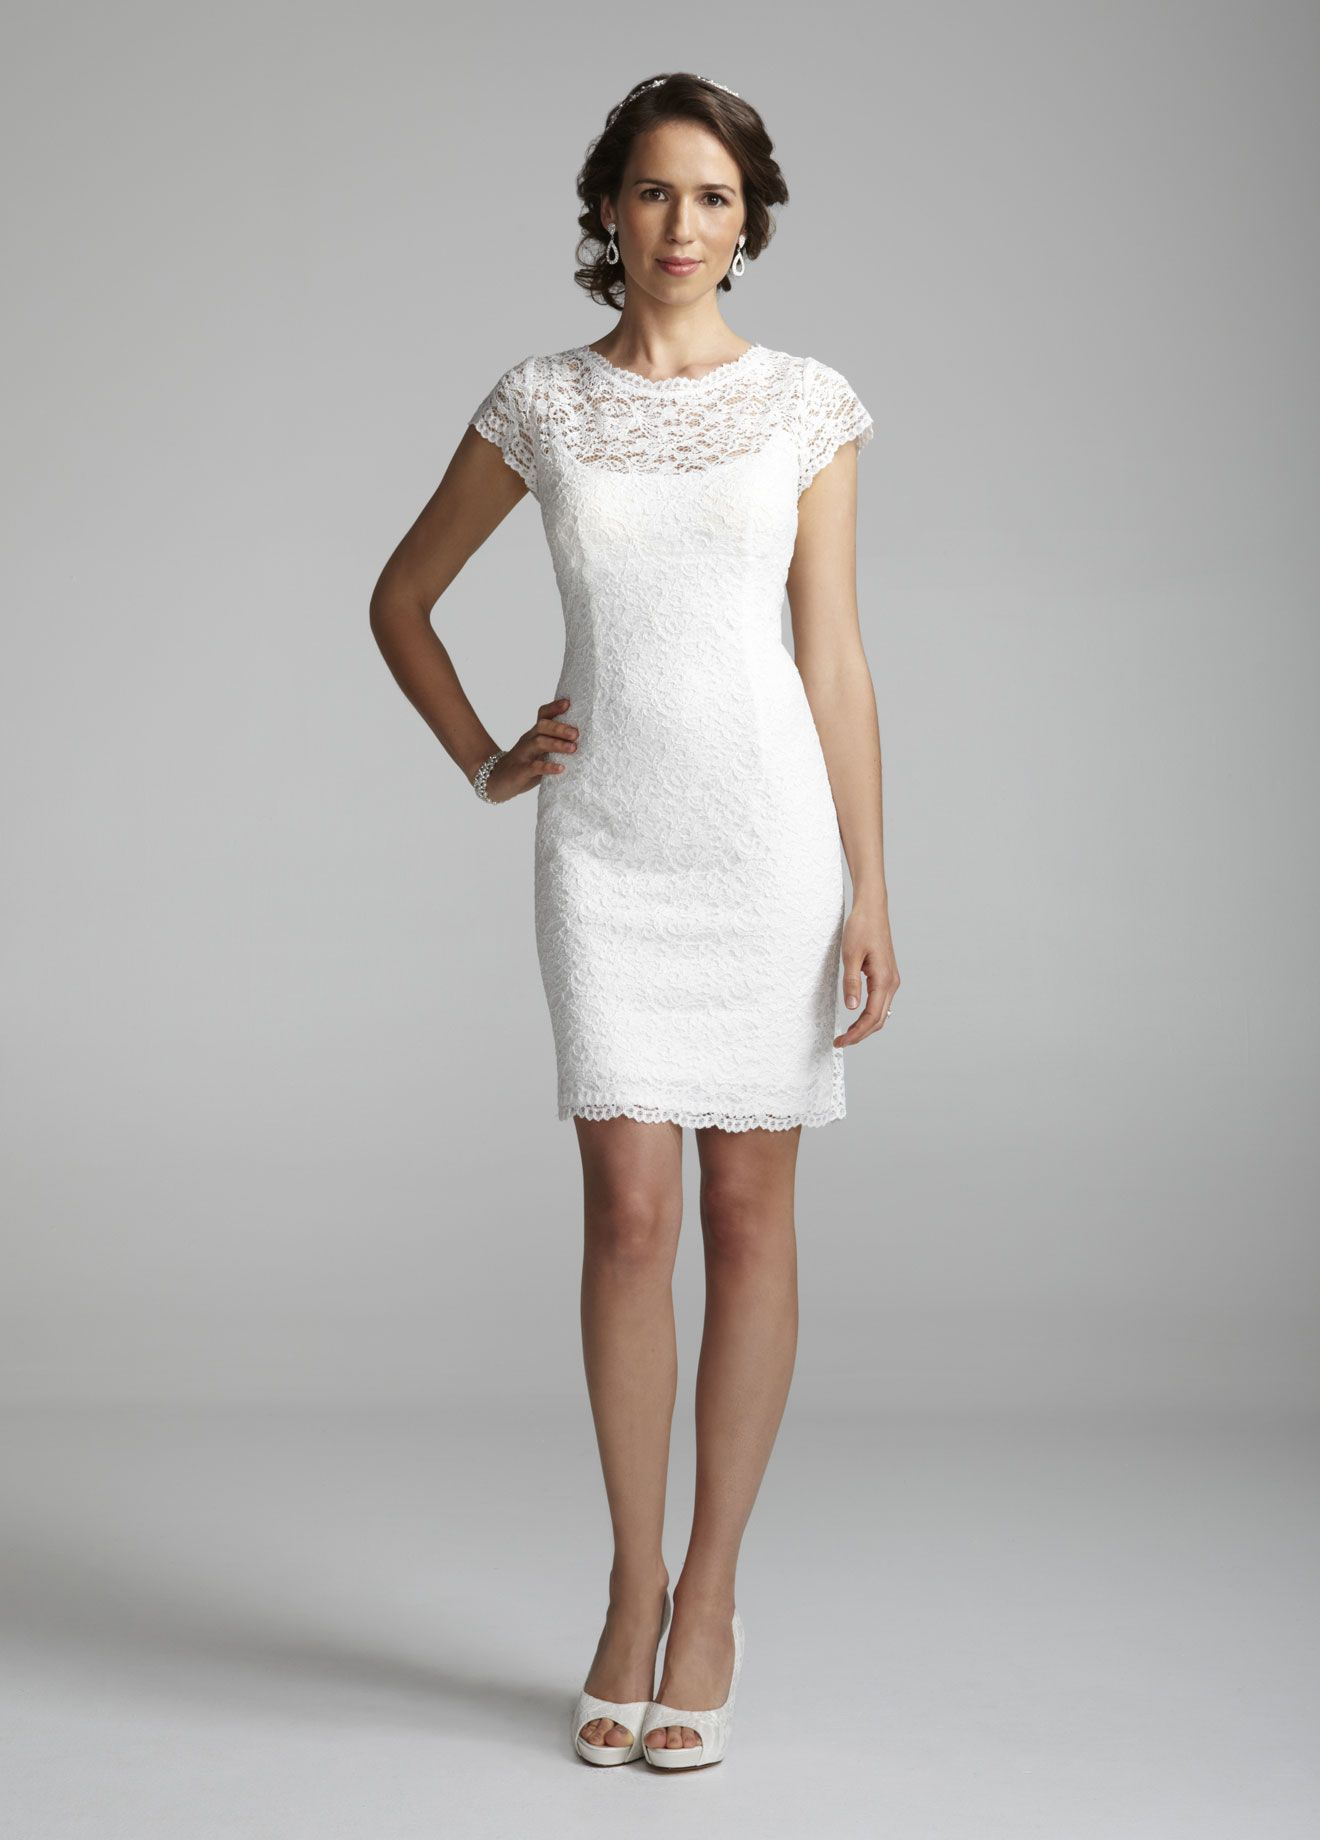 short white lace wedding dresses | Gommap Blog